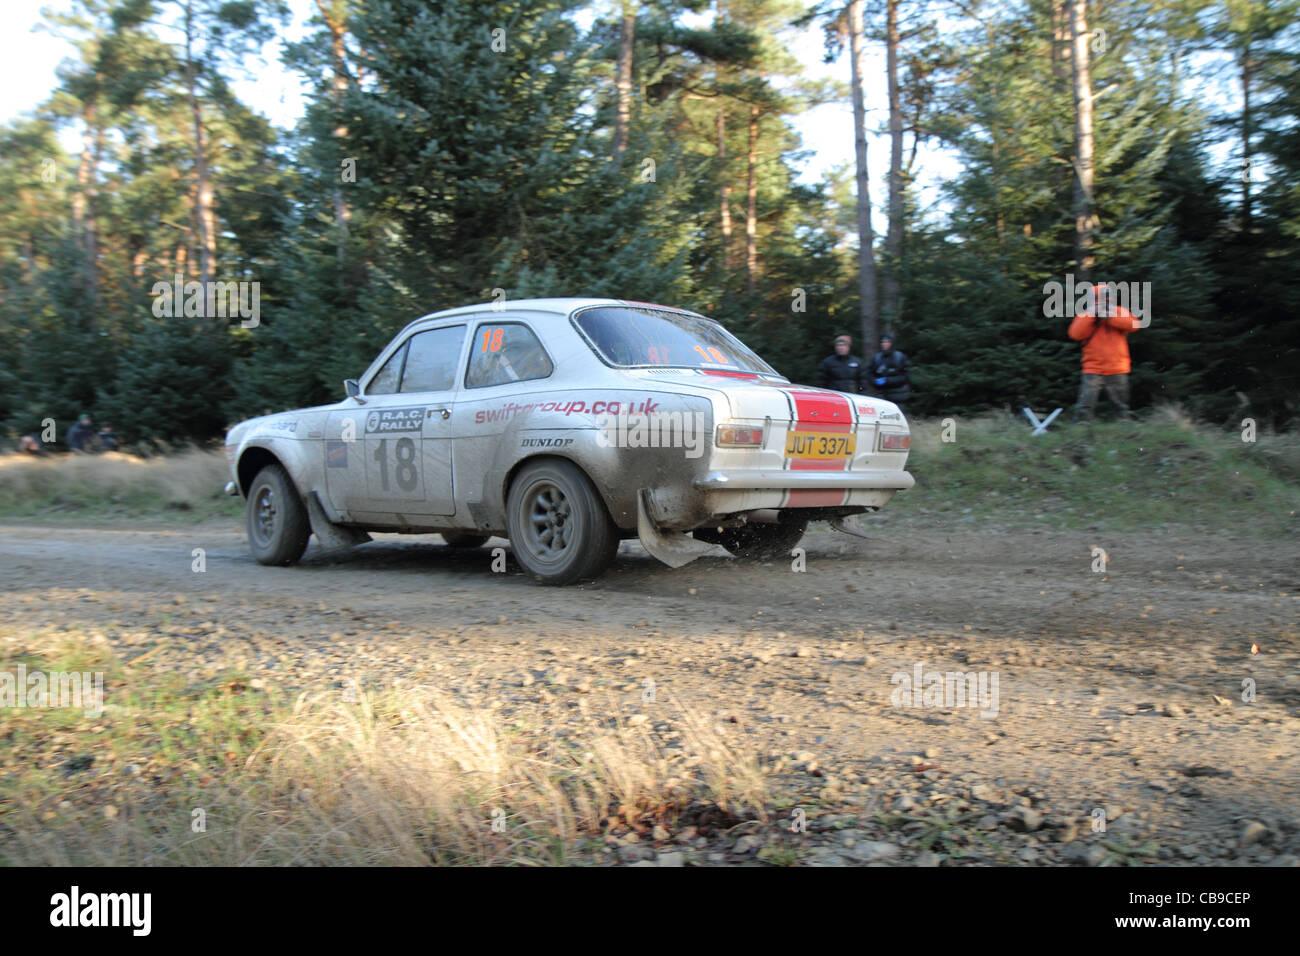 Motor Sport Rally Cars Imagen De Stock